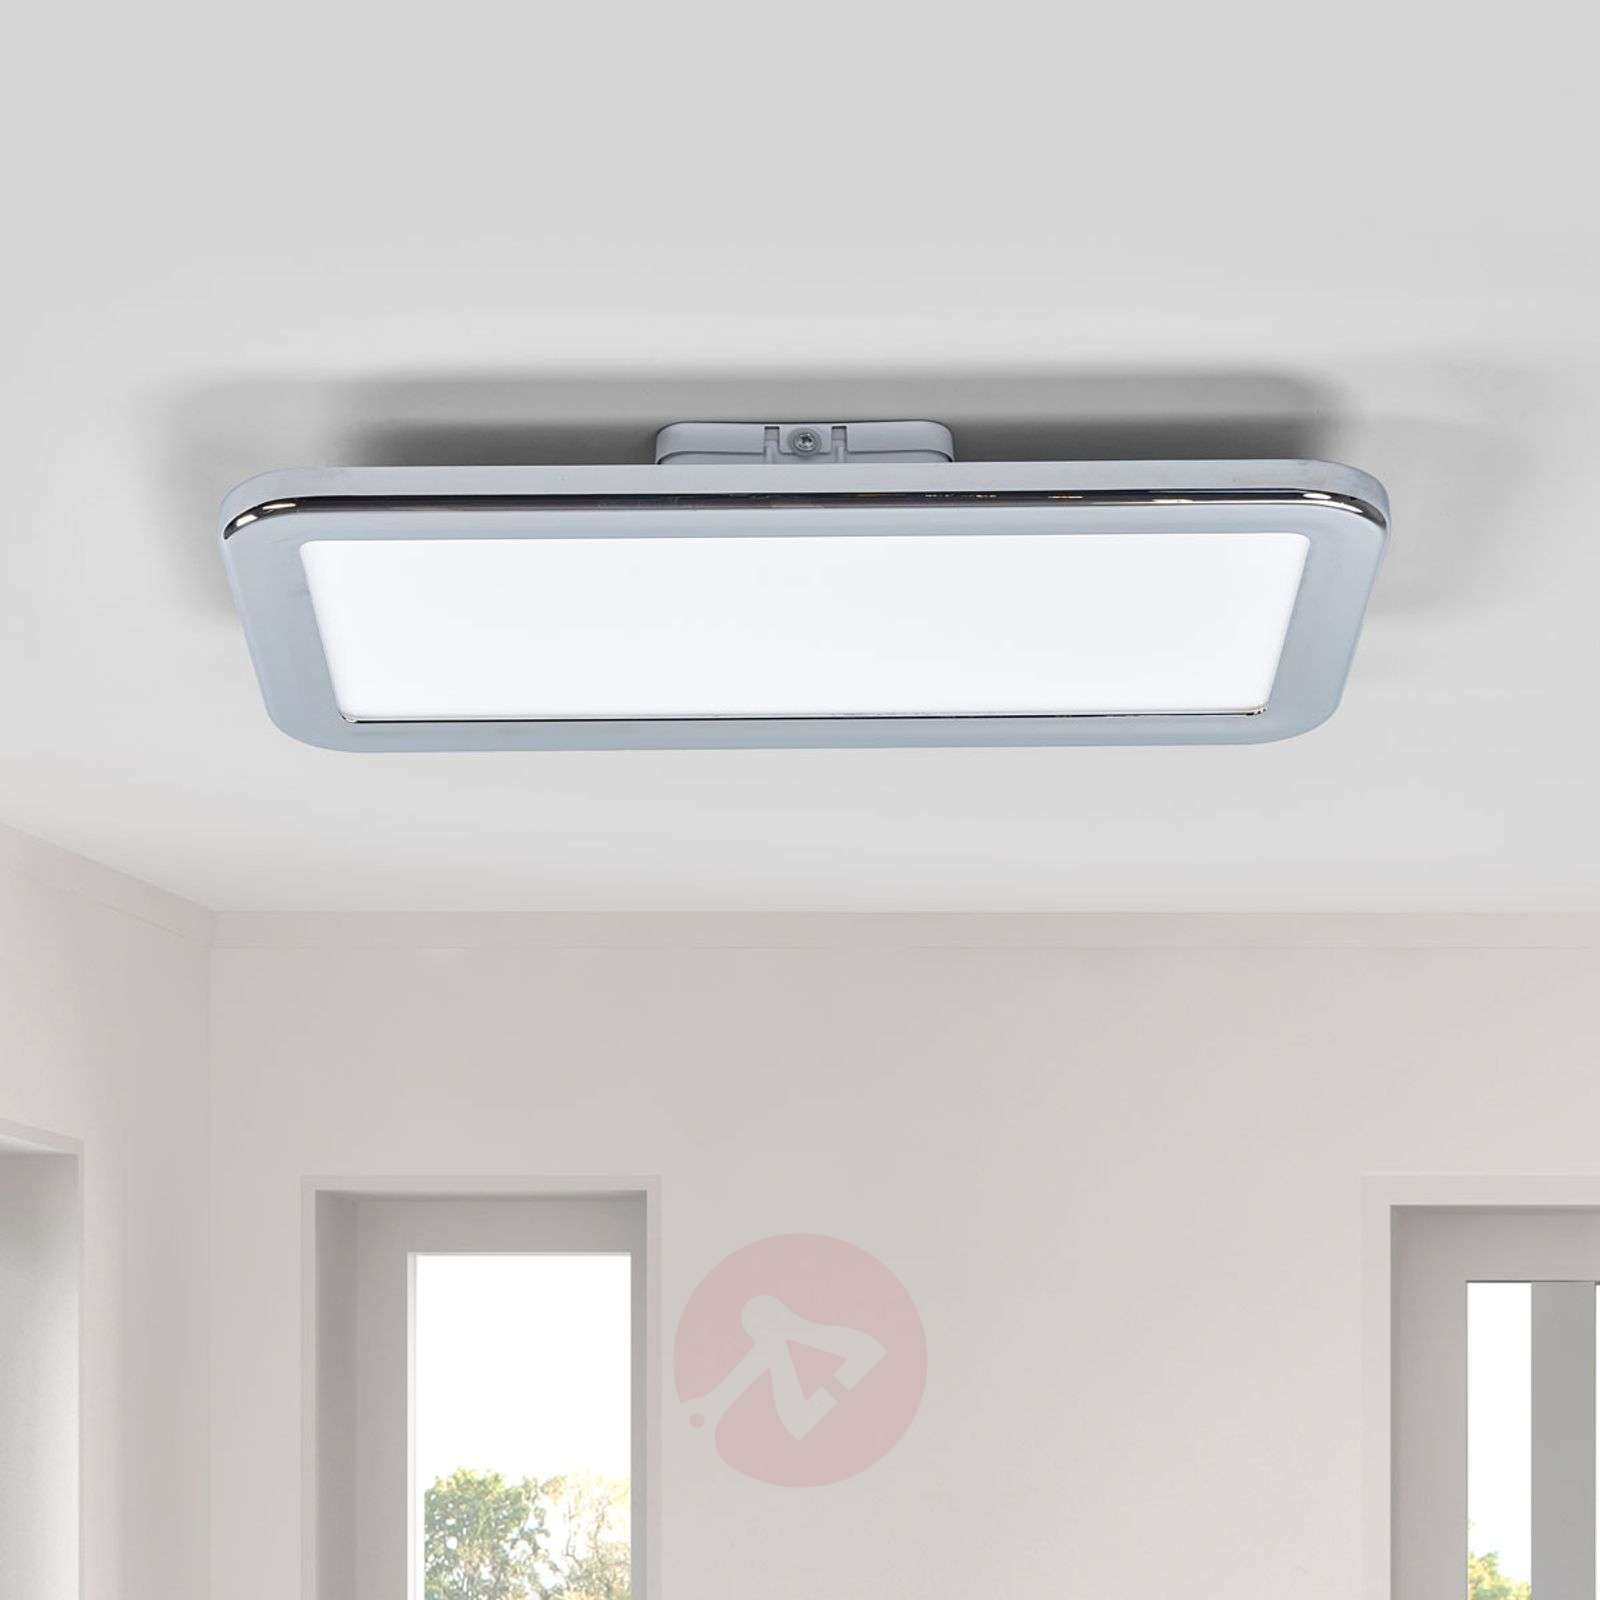 Filina chrome LED bathroom ceiling light, Easydim-1558103-01